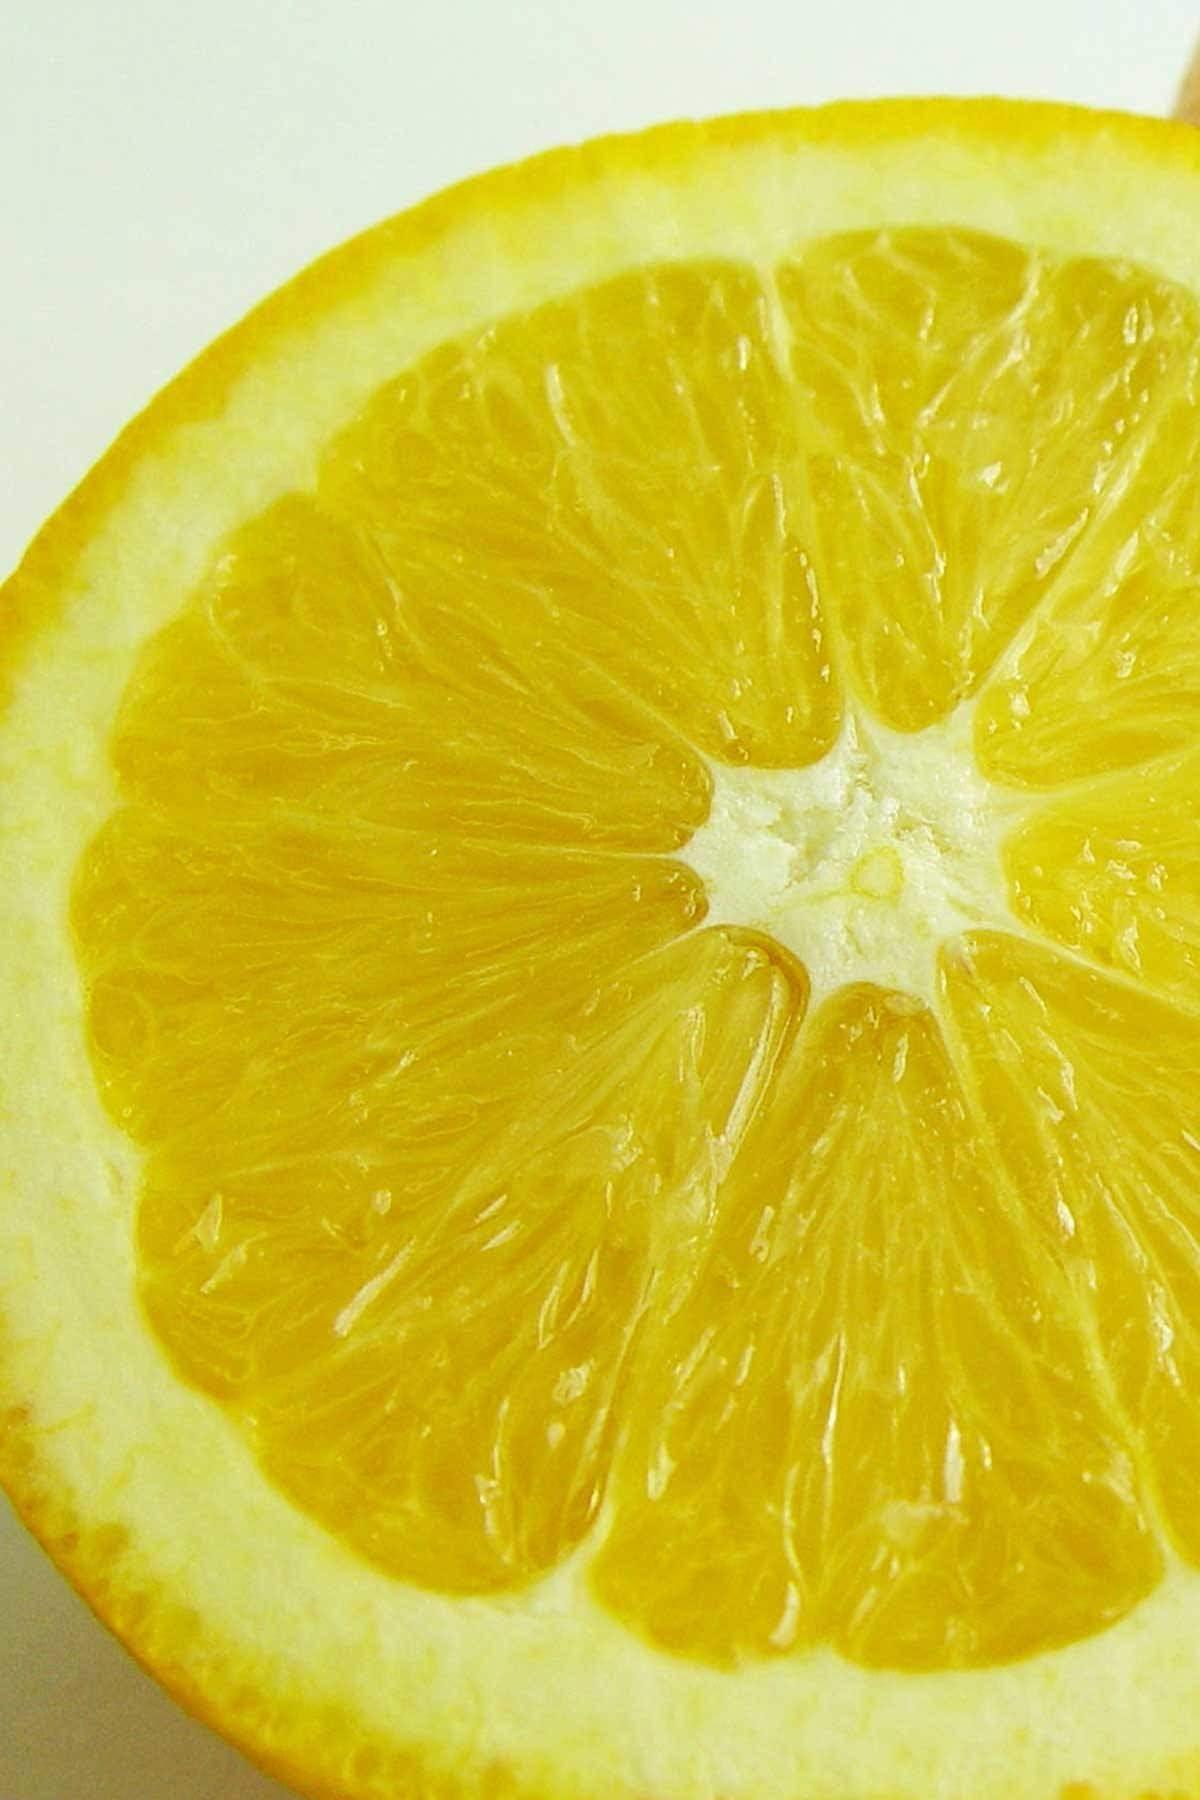 Dwarf Minneola Tangelo Tree Honeybell Hybrid Citrus Excludes: CA,TX,LA,Az